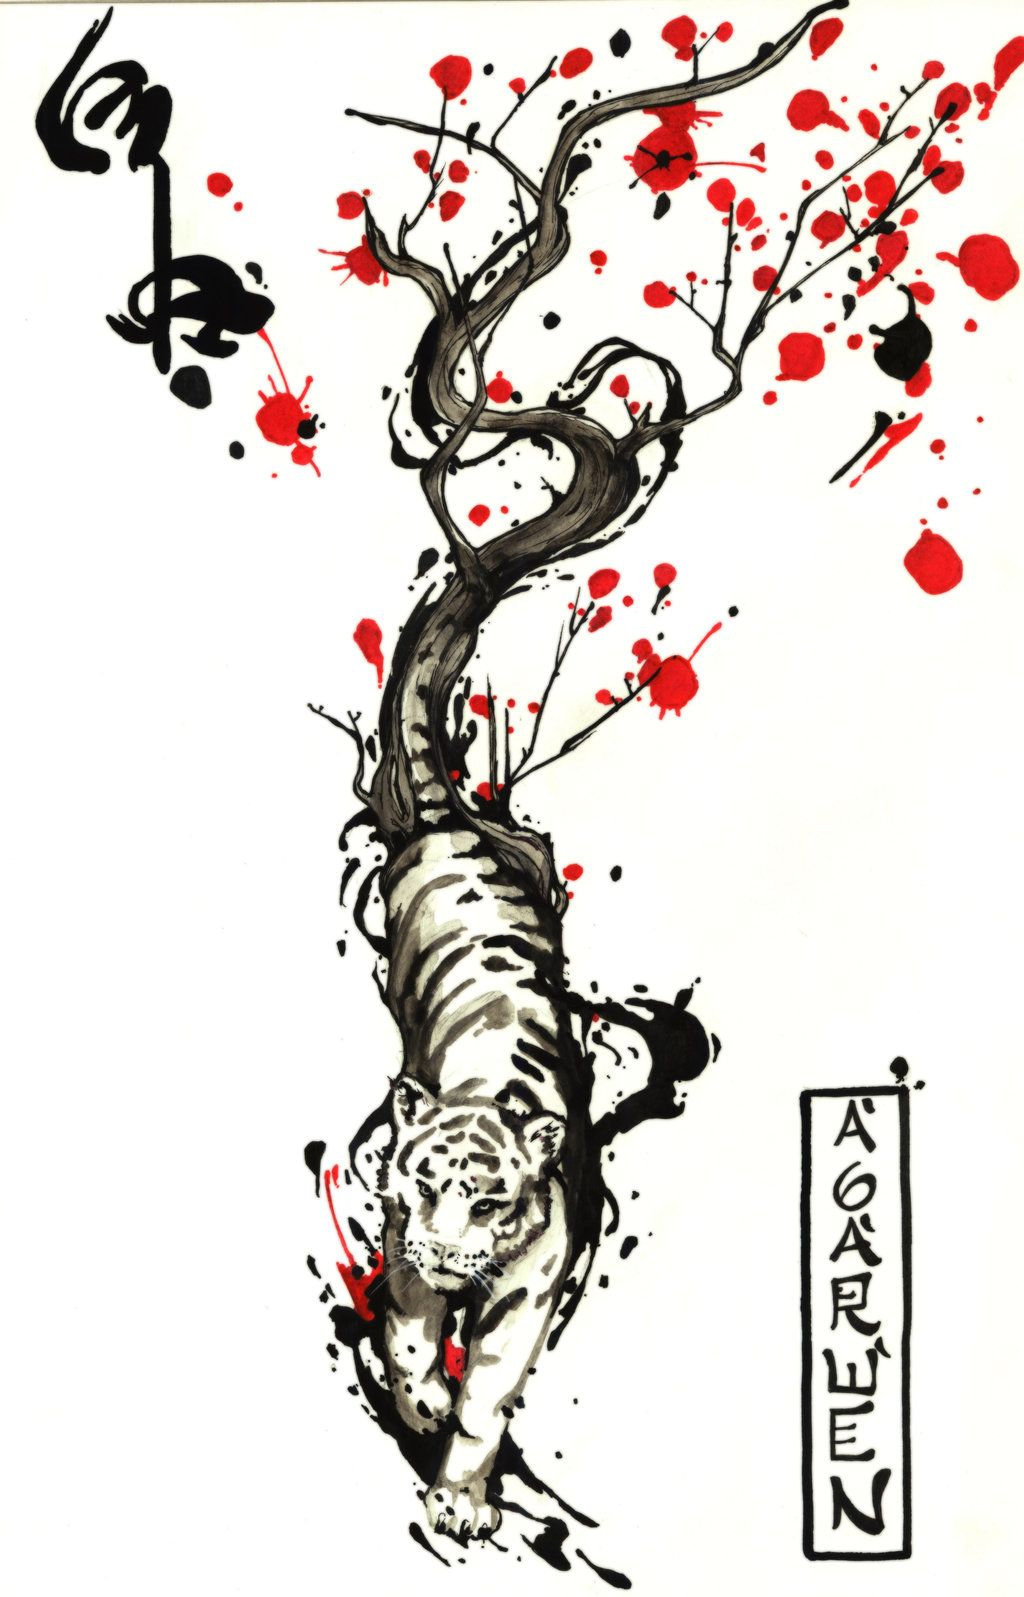 Lethal hardcore asian bbw